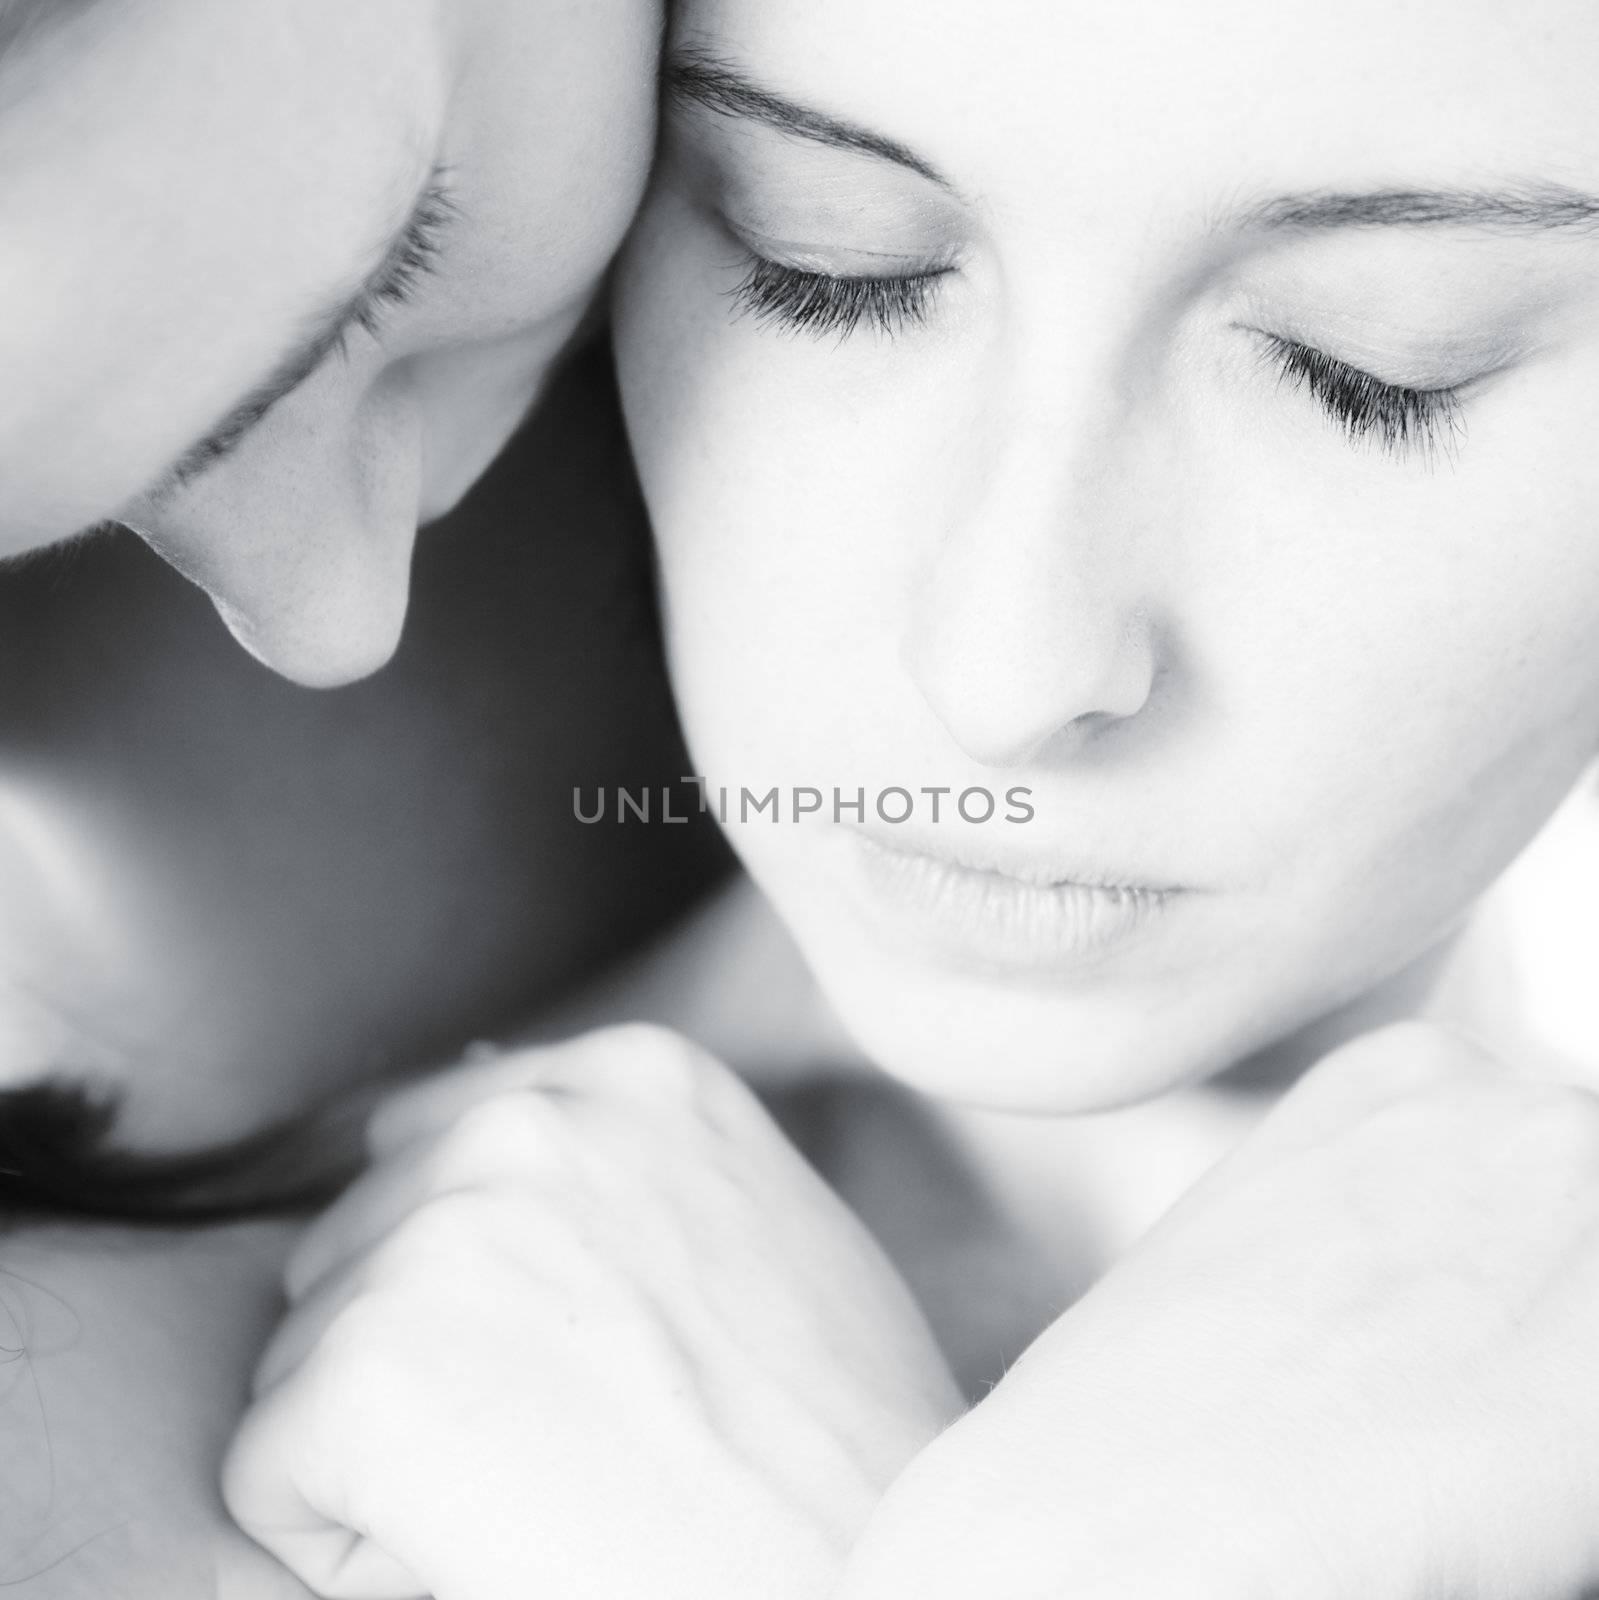 two beauty girlfriends in lingerie in the photo studio